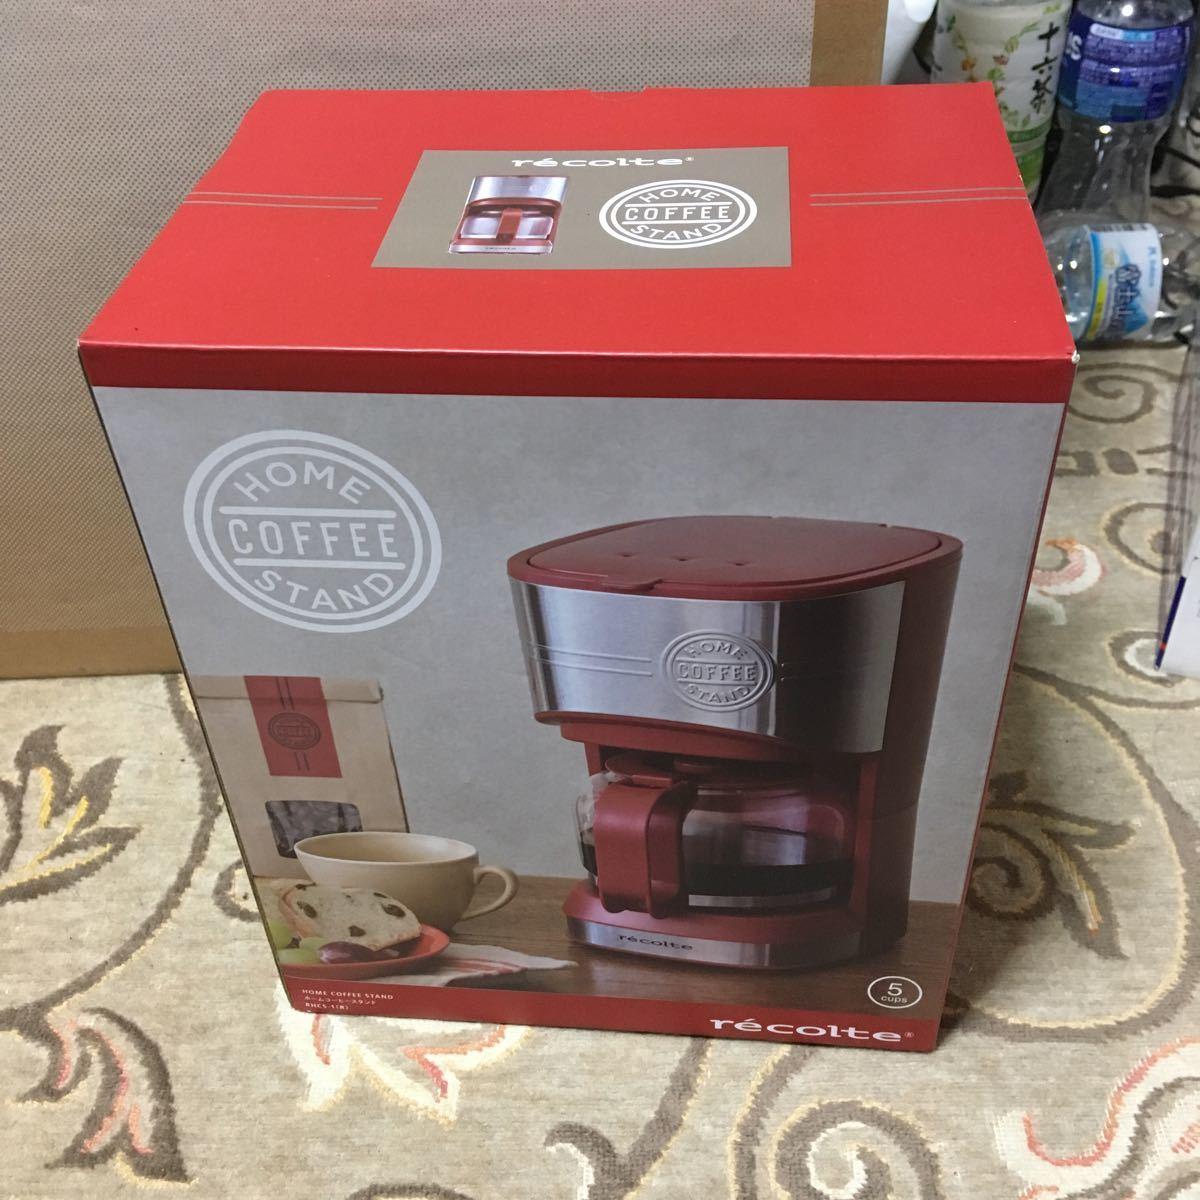 recolte コーヒーメーカー 【エラゲリンSHOP】